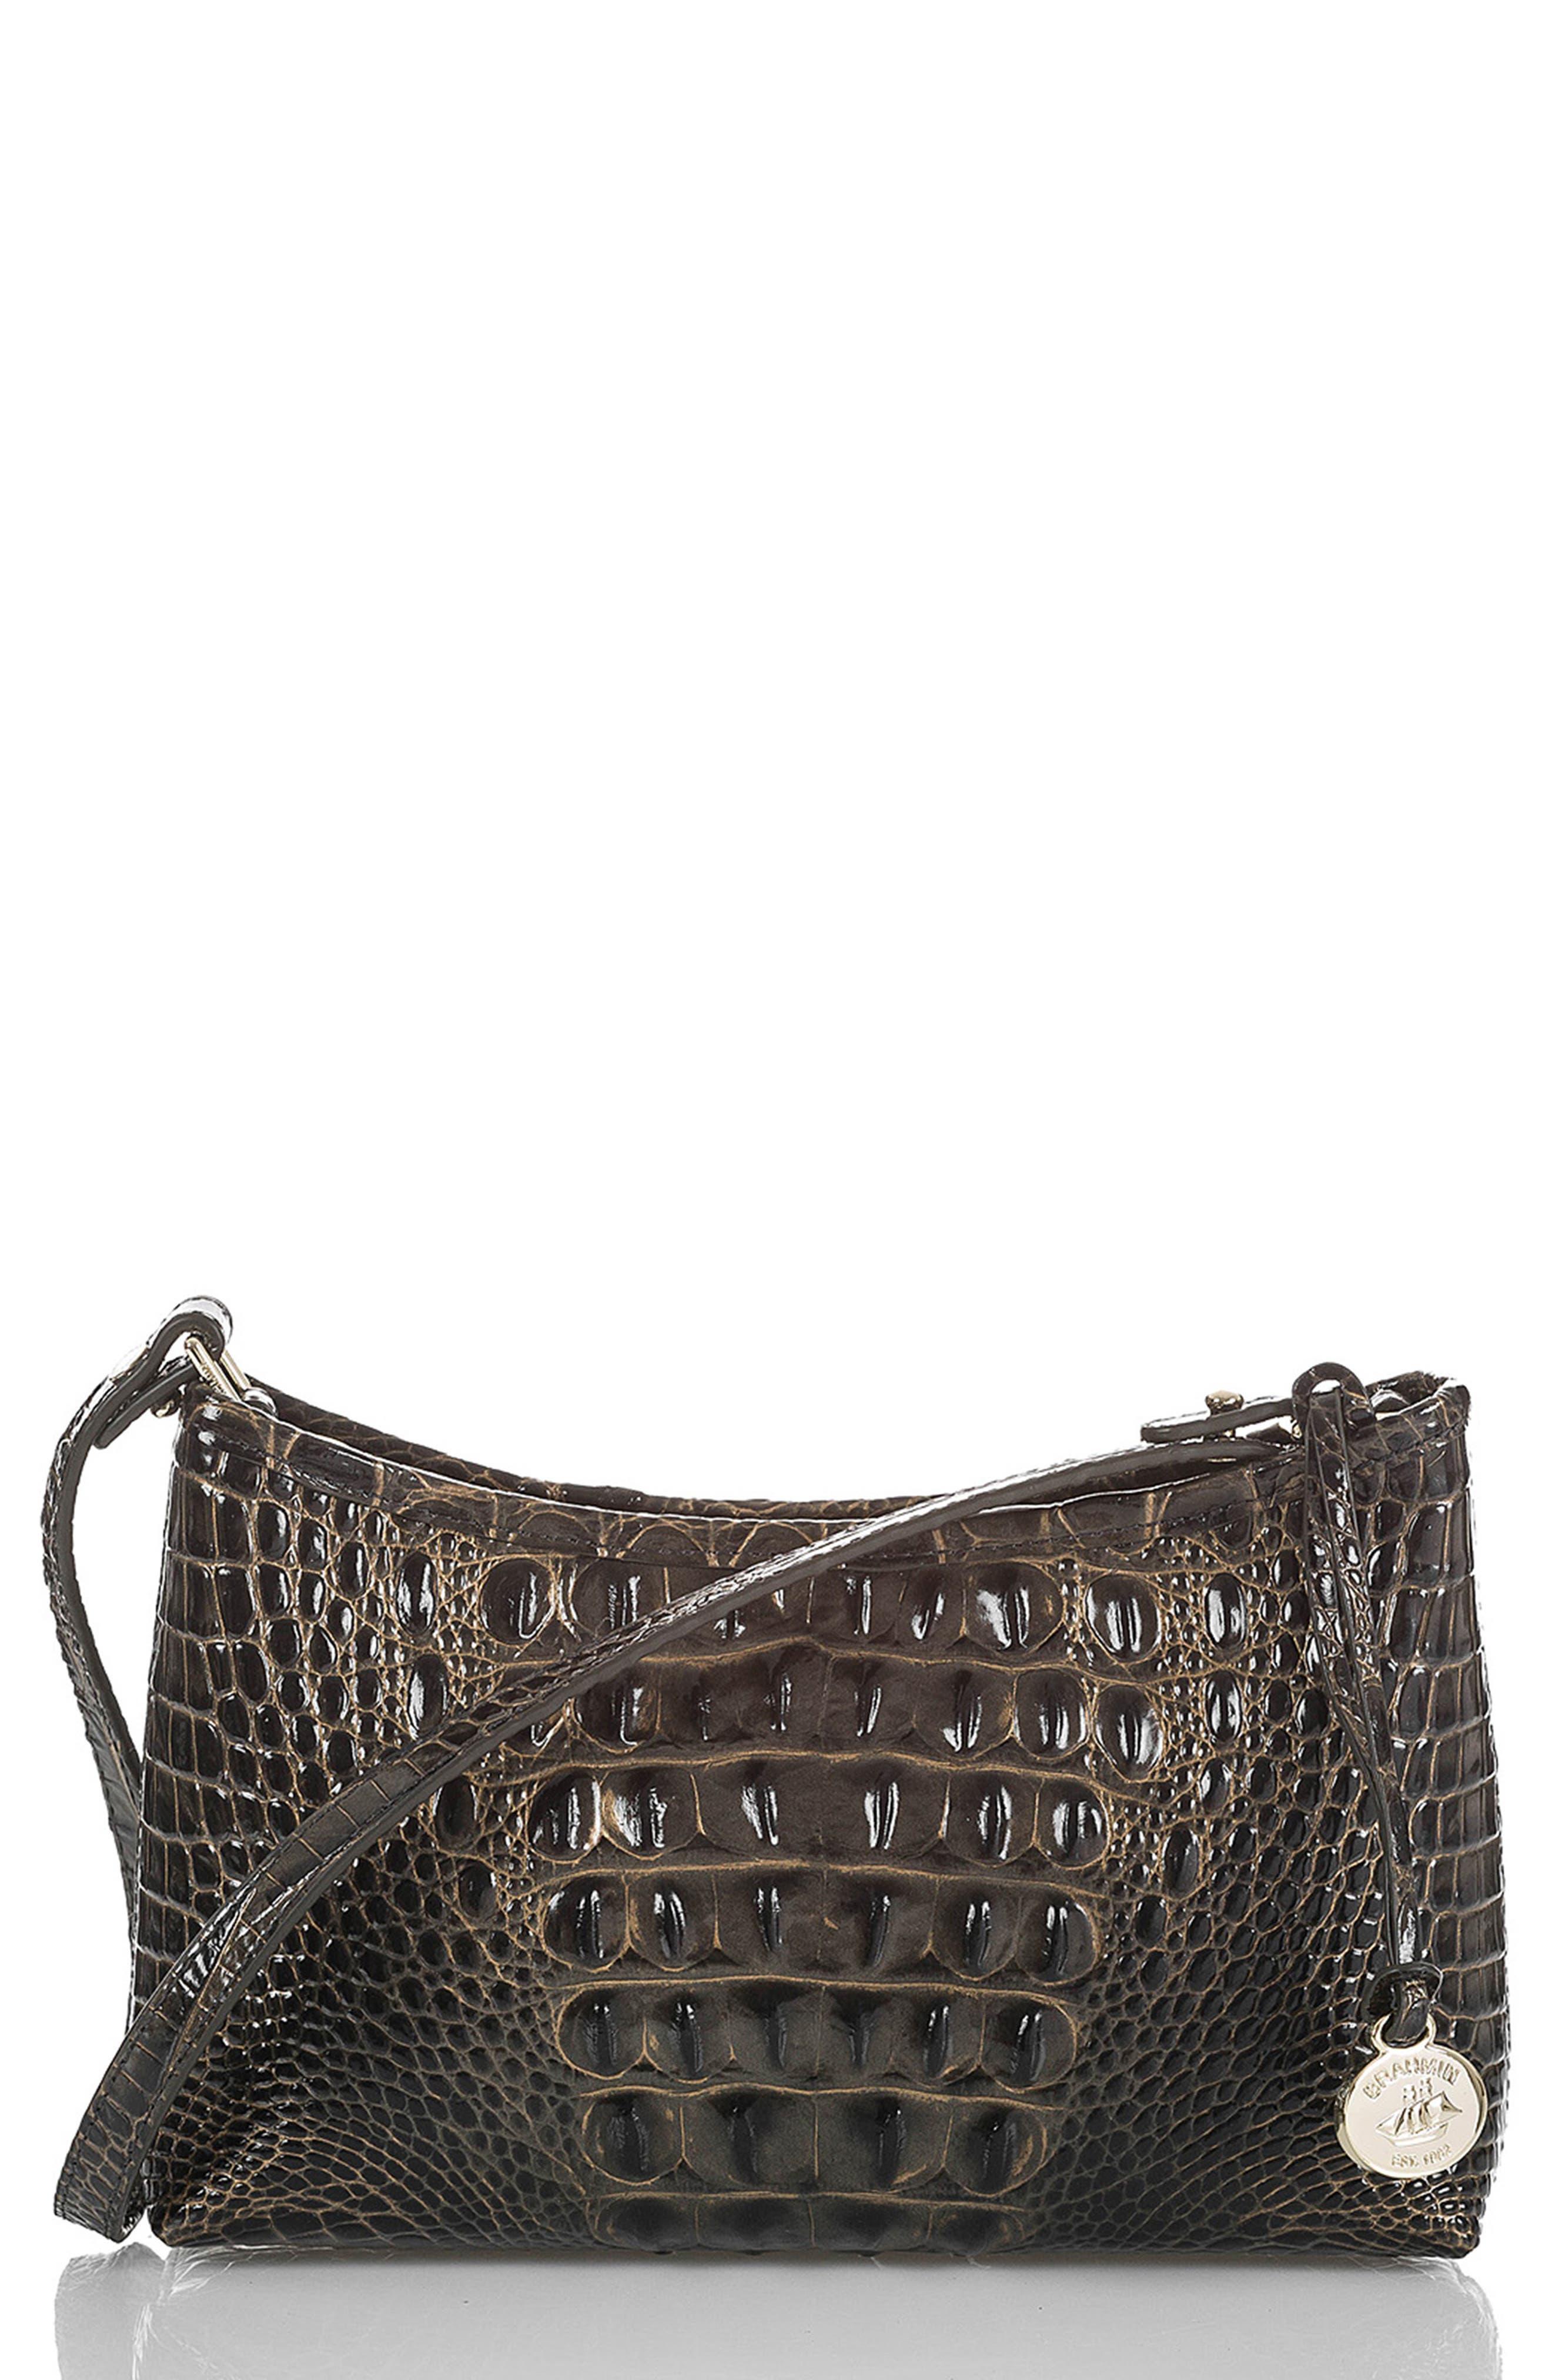 'Anytime - Mini' Convertible Handbag,                         Main,                         color, GRAPHITE